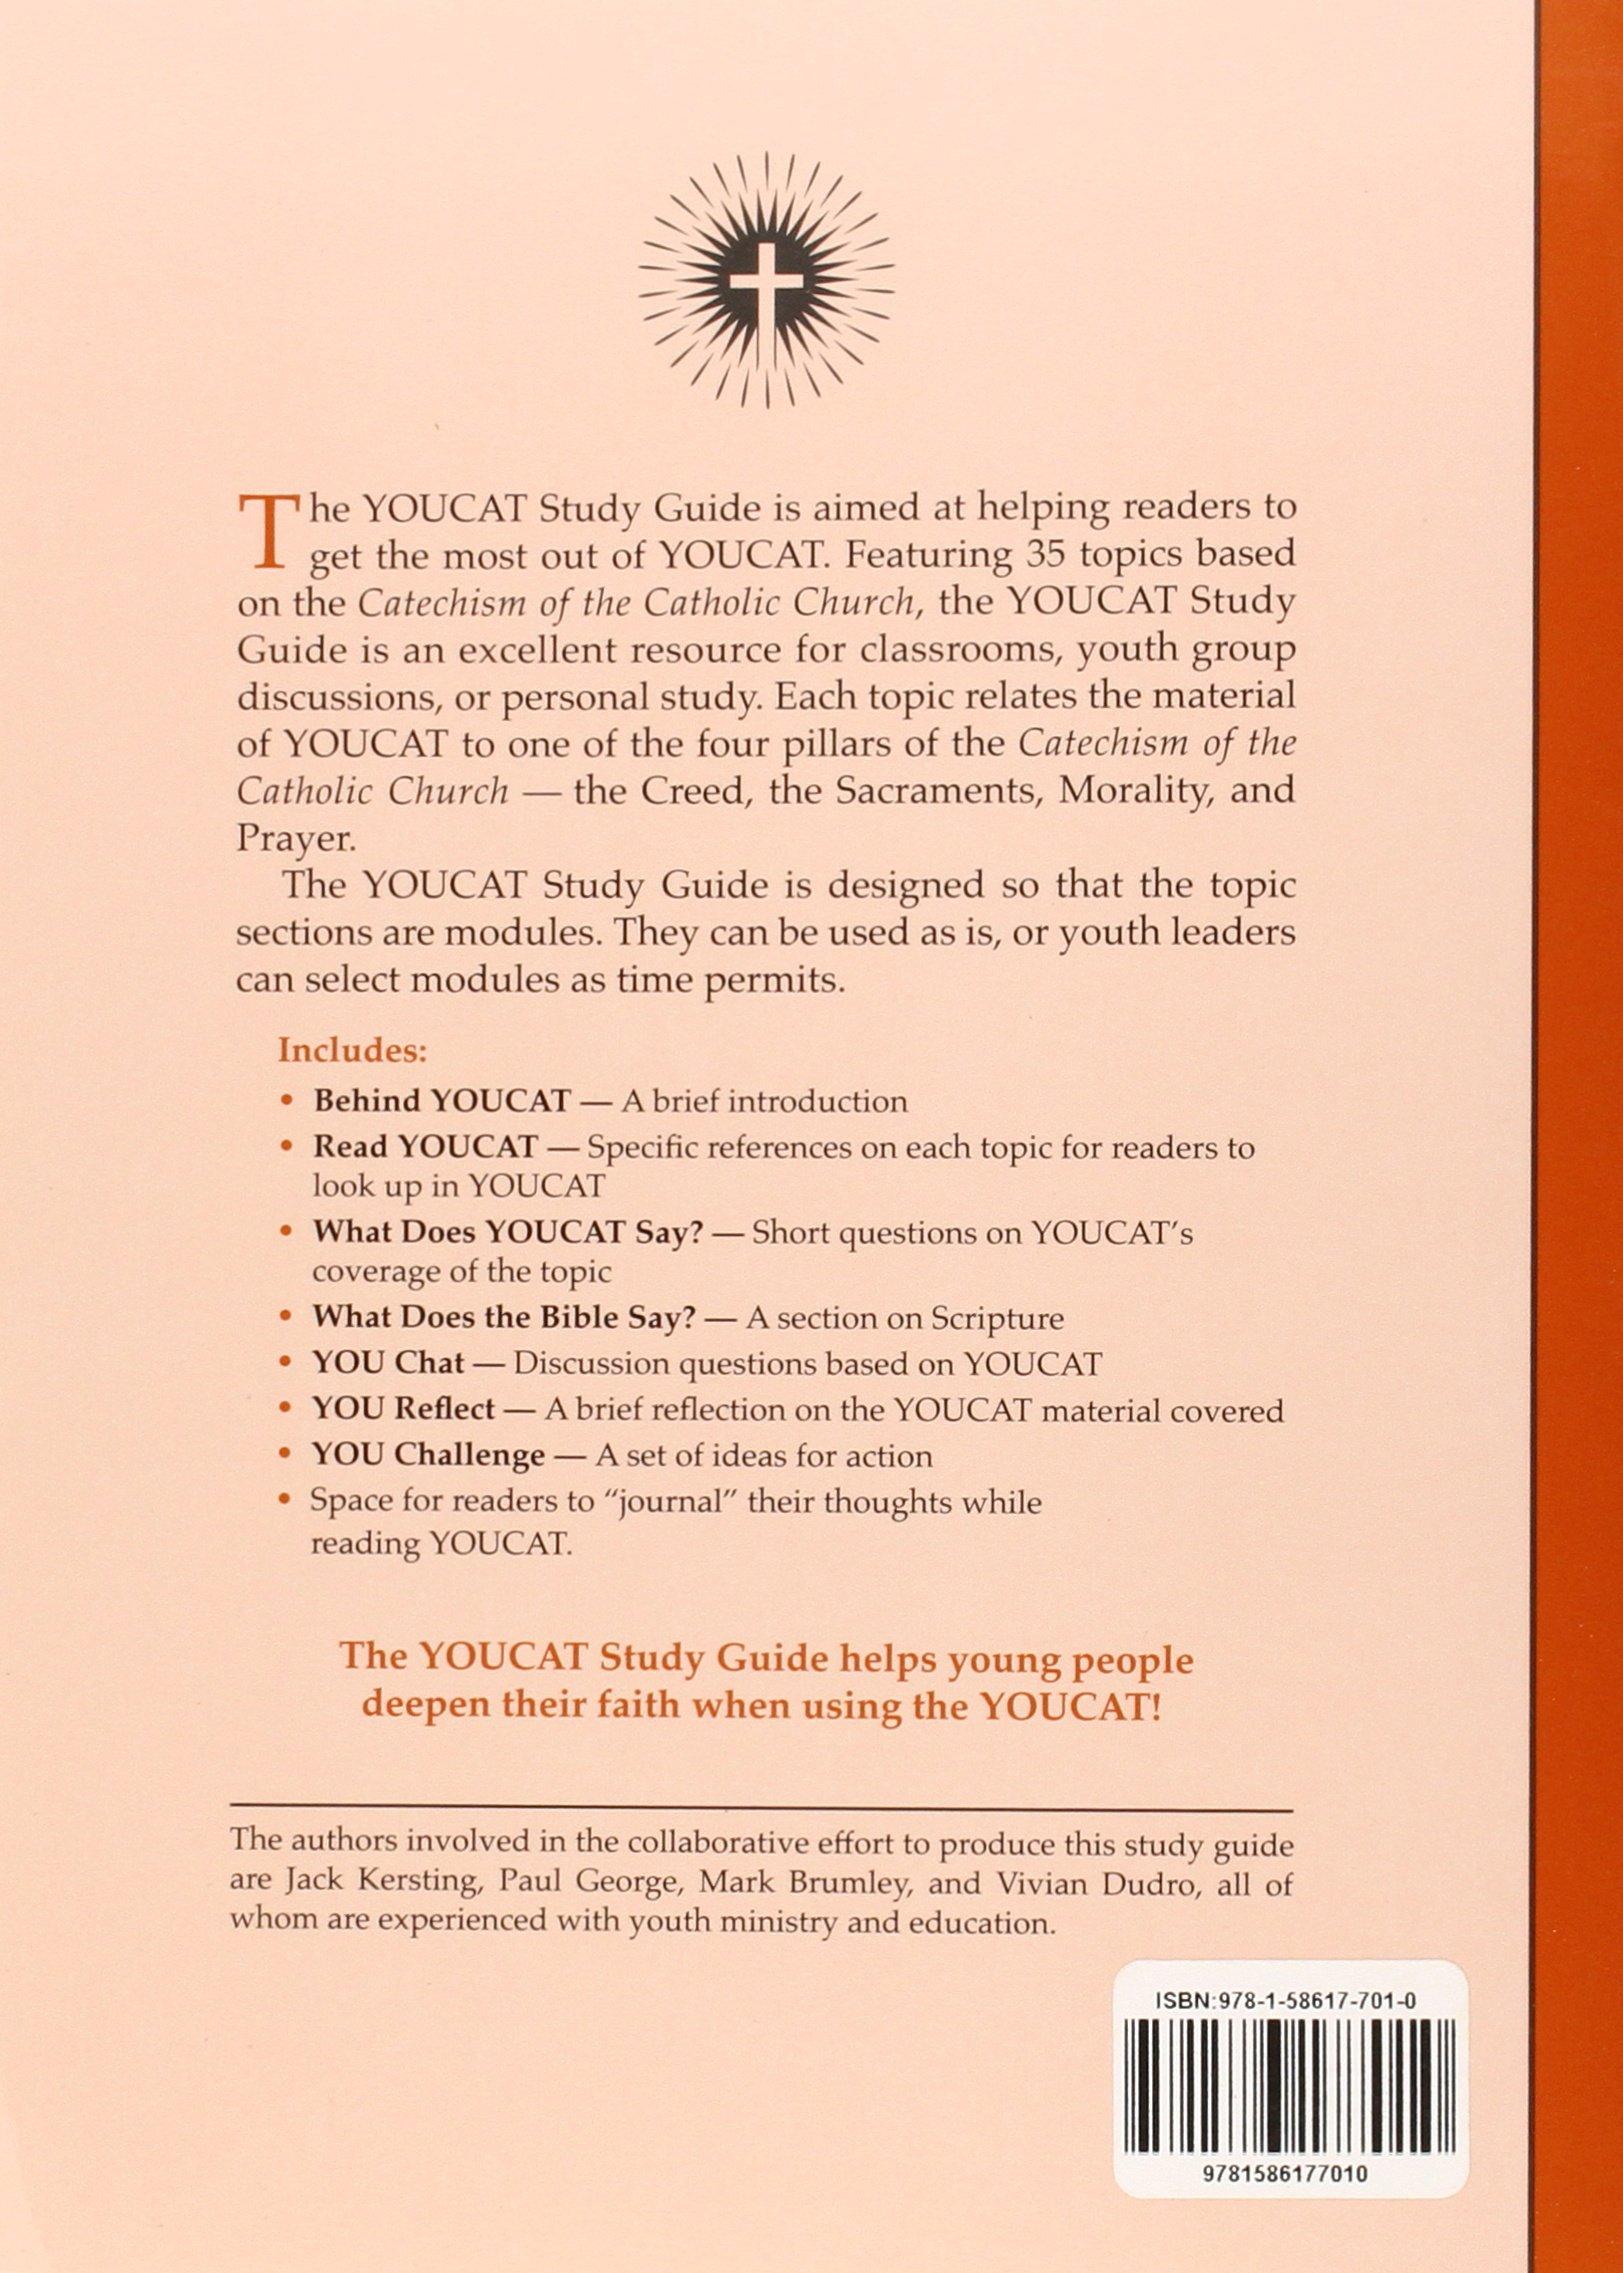 Youcat Study Guide: Mark Brumley, Jack Kersting, Paul George, Vivian Dudro:  9781586177010: Amazon.com: Books